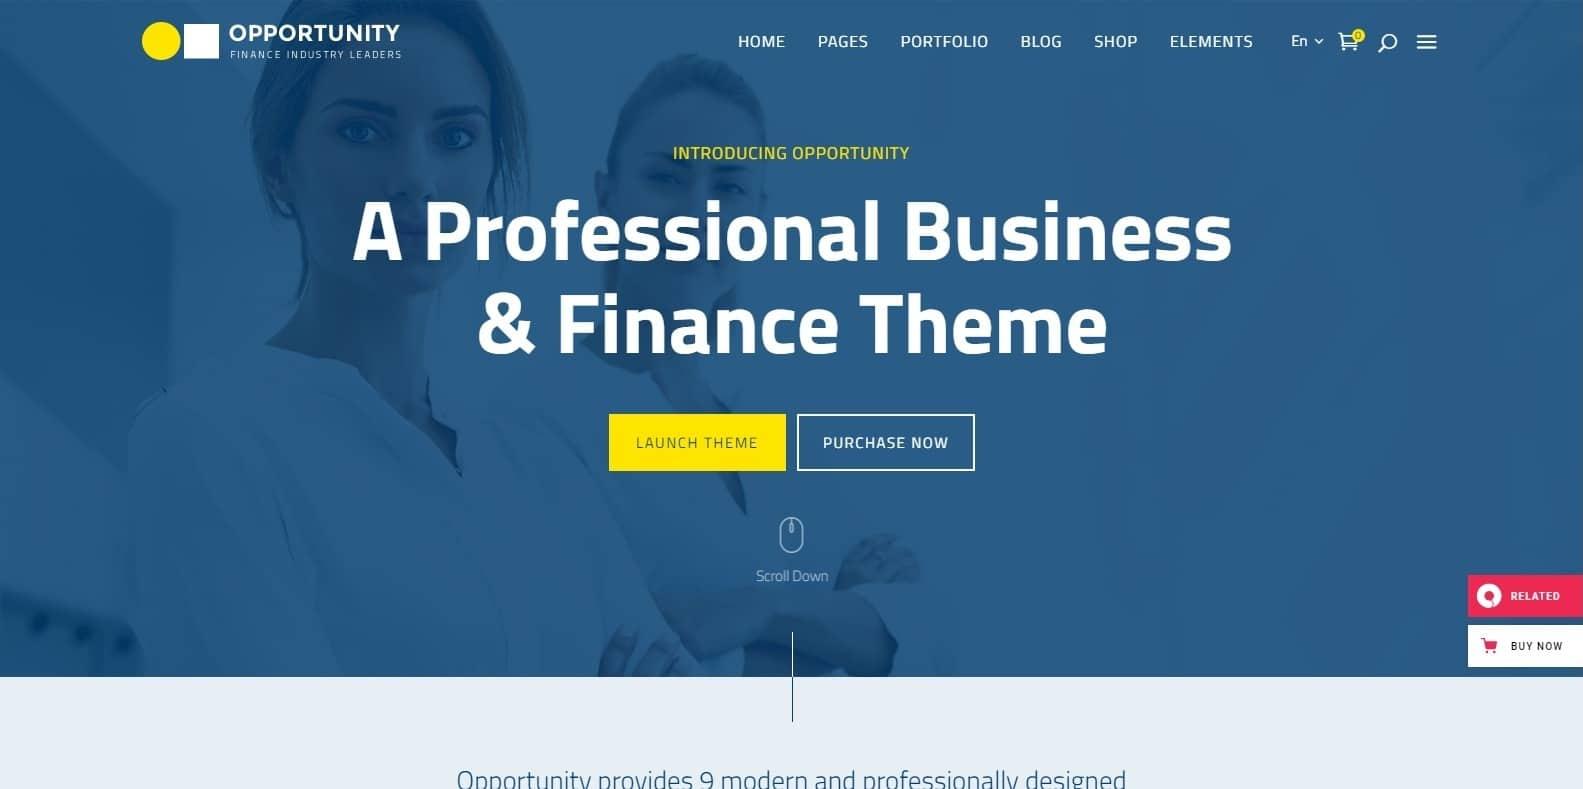 opportunity-finance-webaite-template